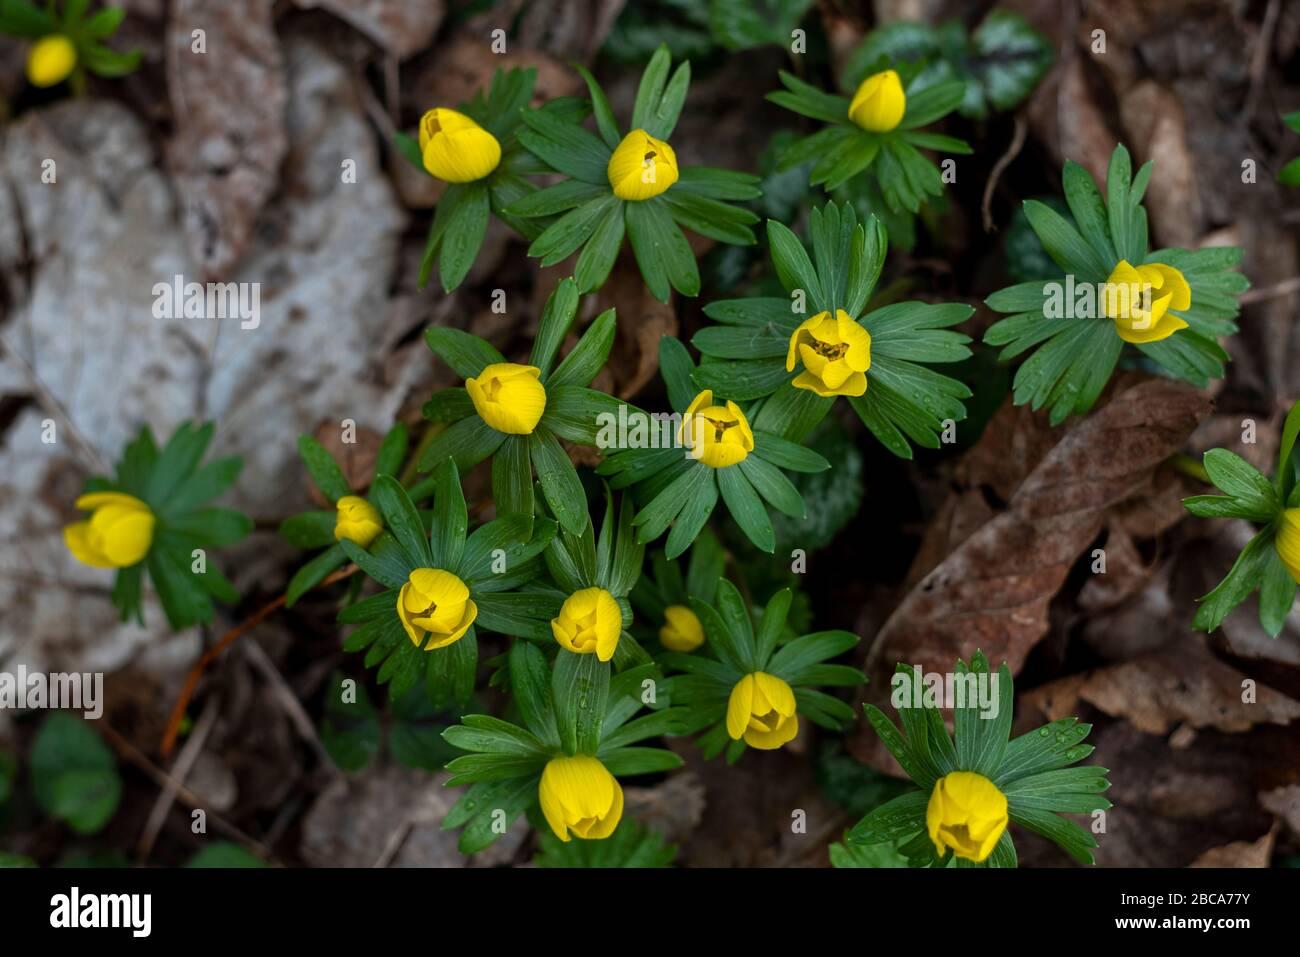 Winter aconites, signs of spring, Eranthis hyemalis Stock Photo